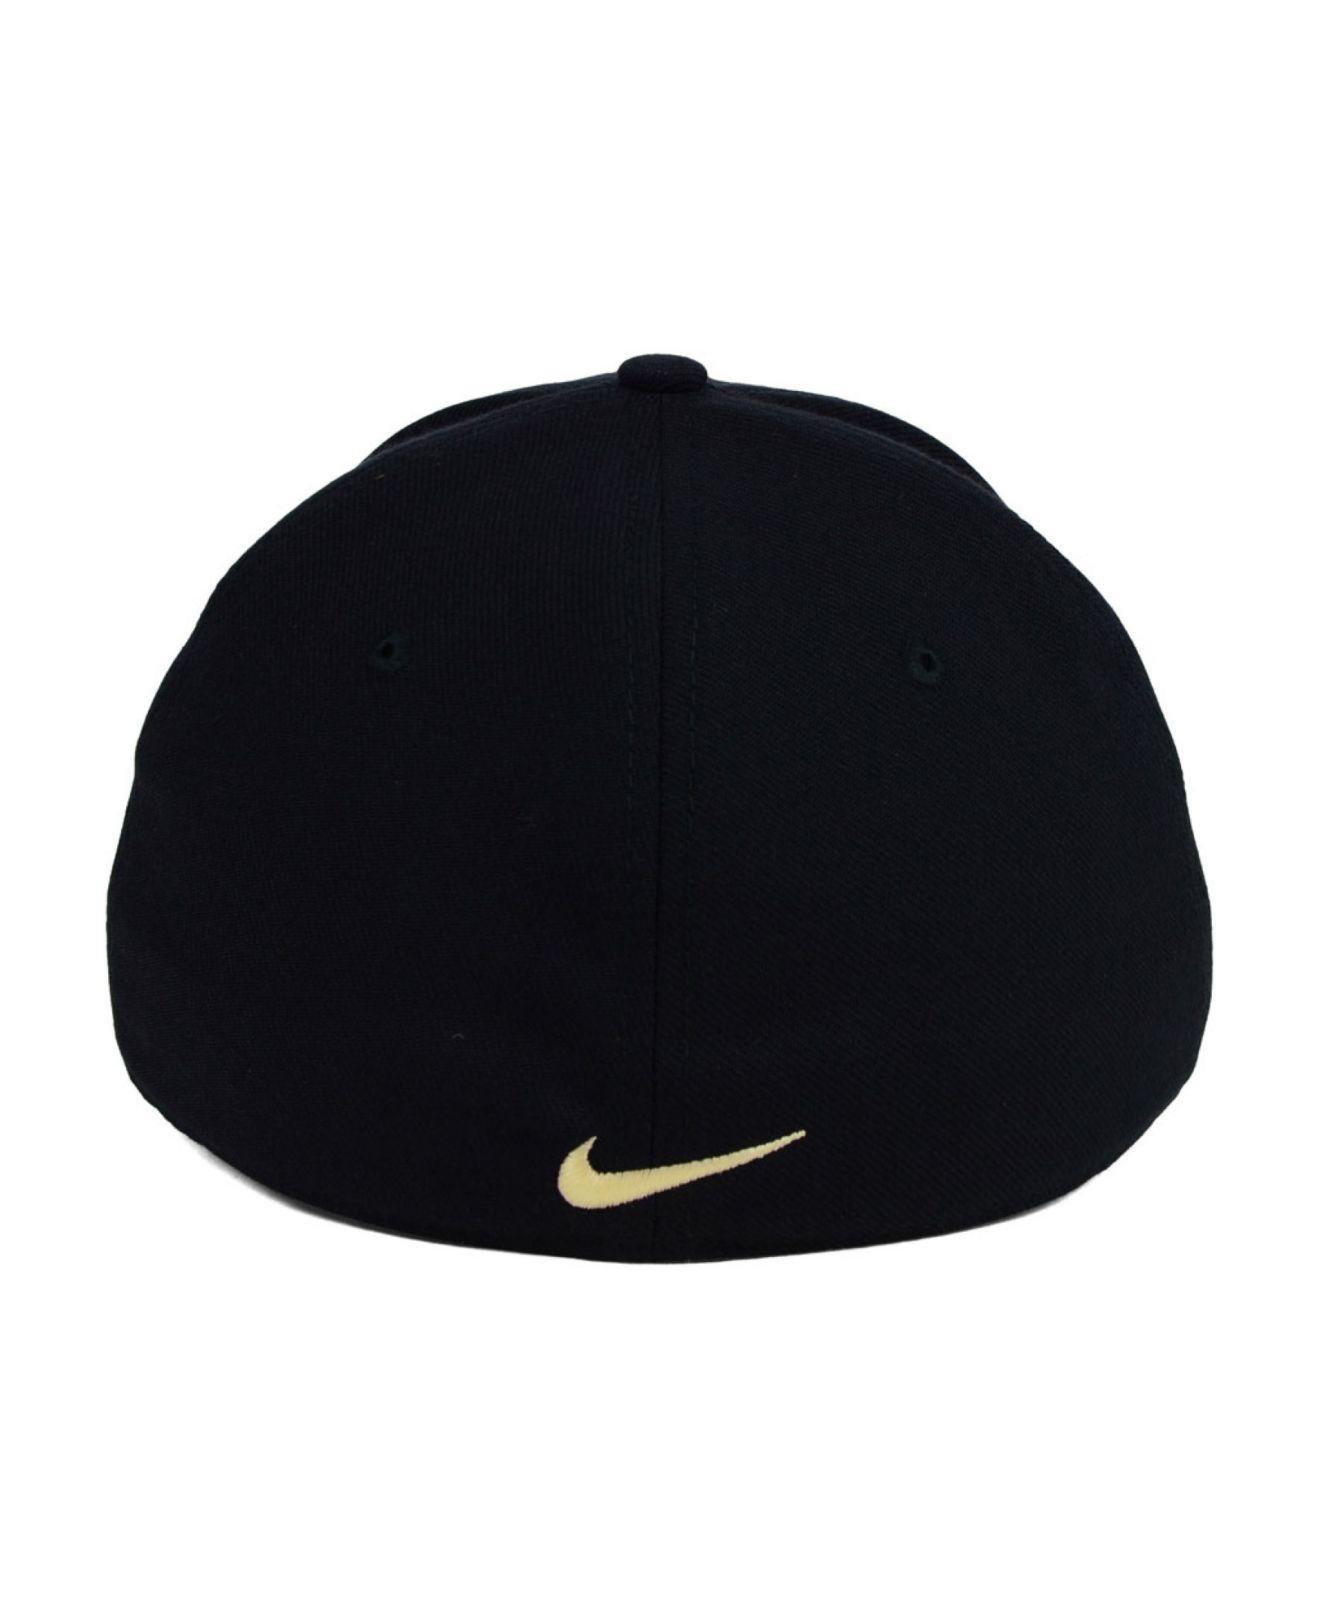 bc8ca7d28aa Lyst - Nike Colorado Buffaloes Dri-Fit Swooshflex Cap in Black for Men